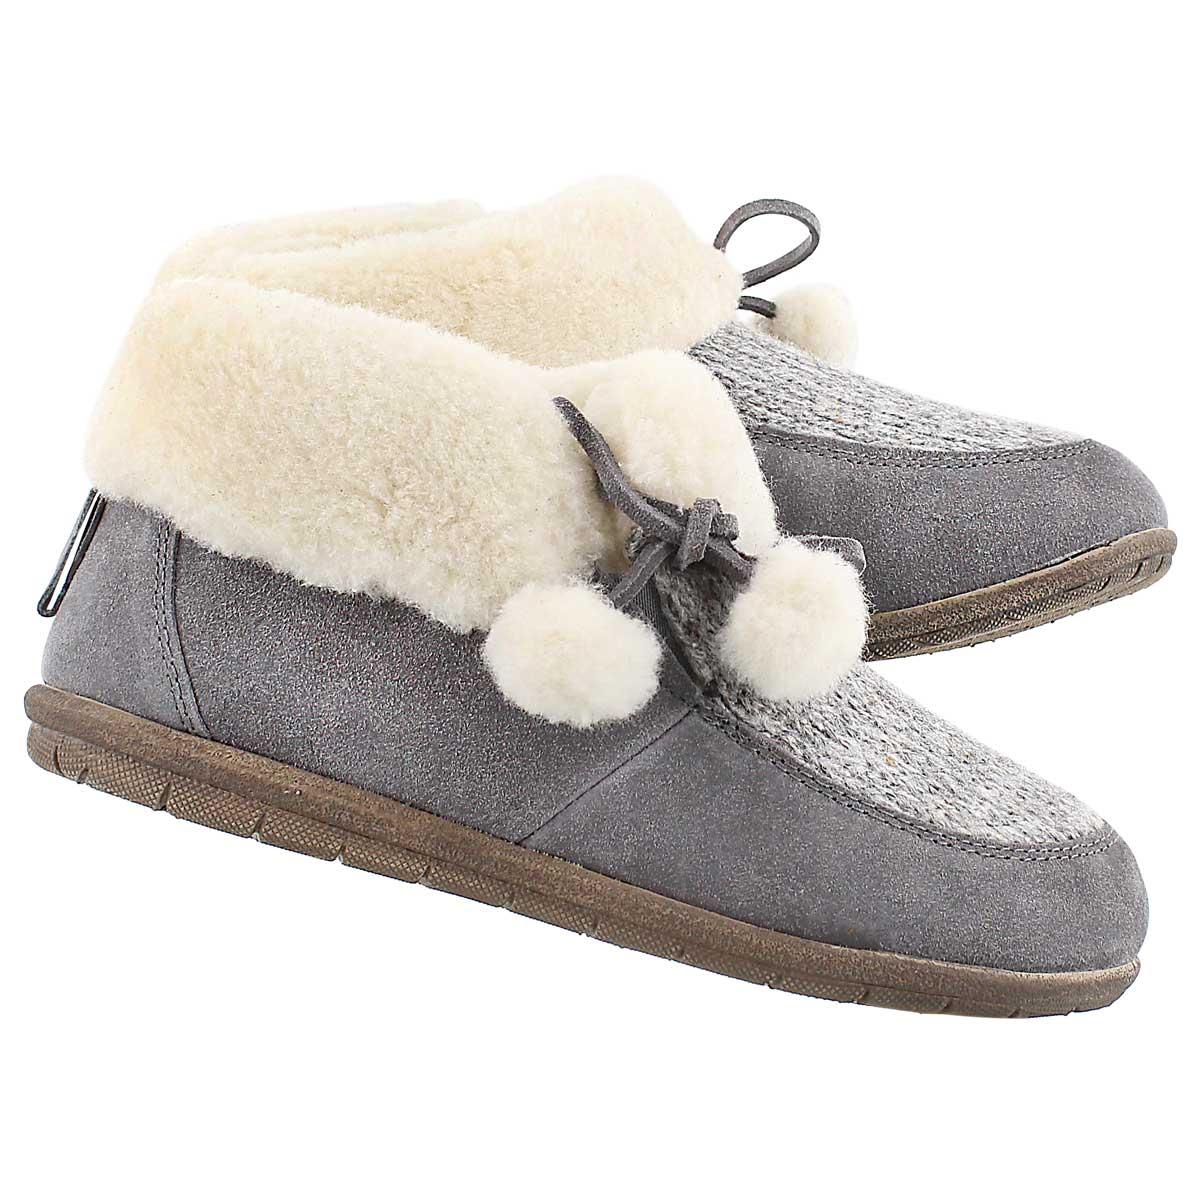 Lds Aspen grey closed back slipper